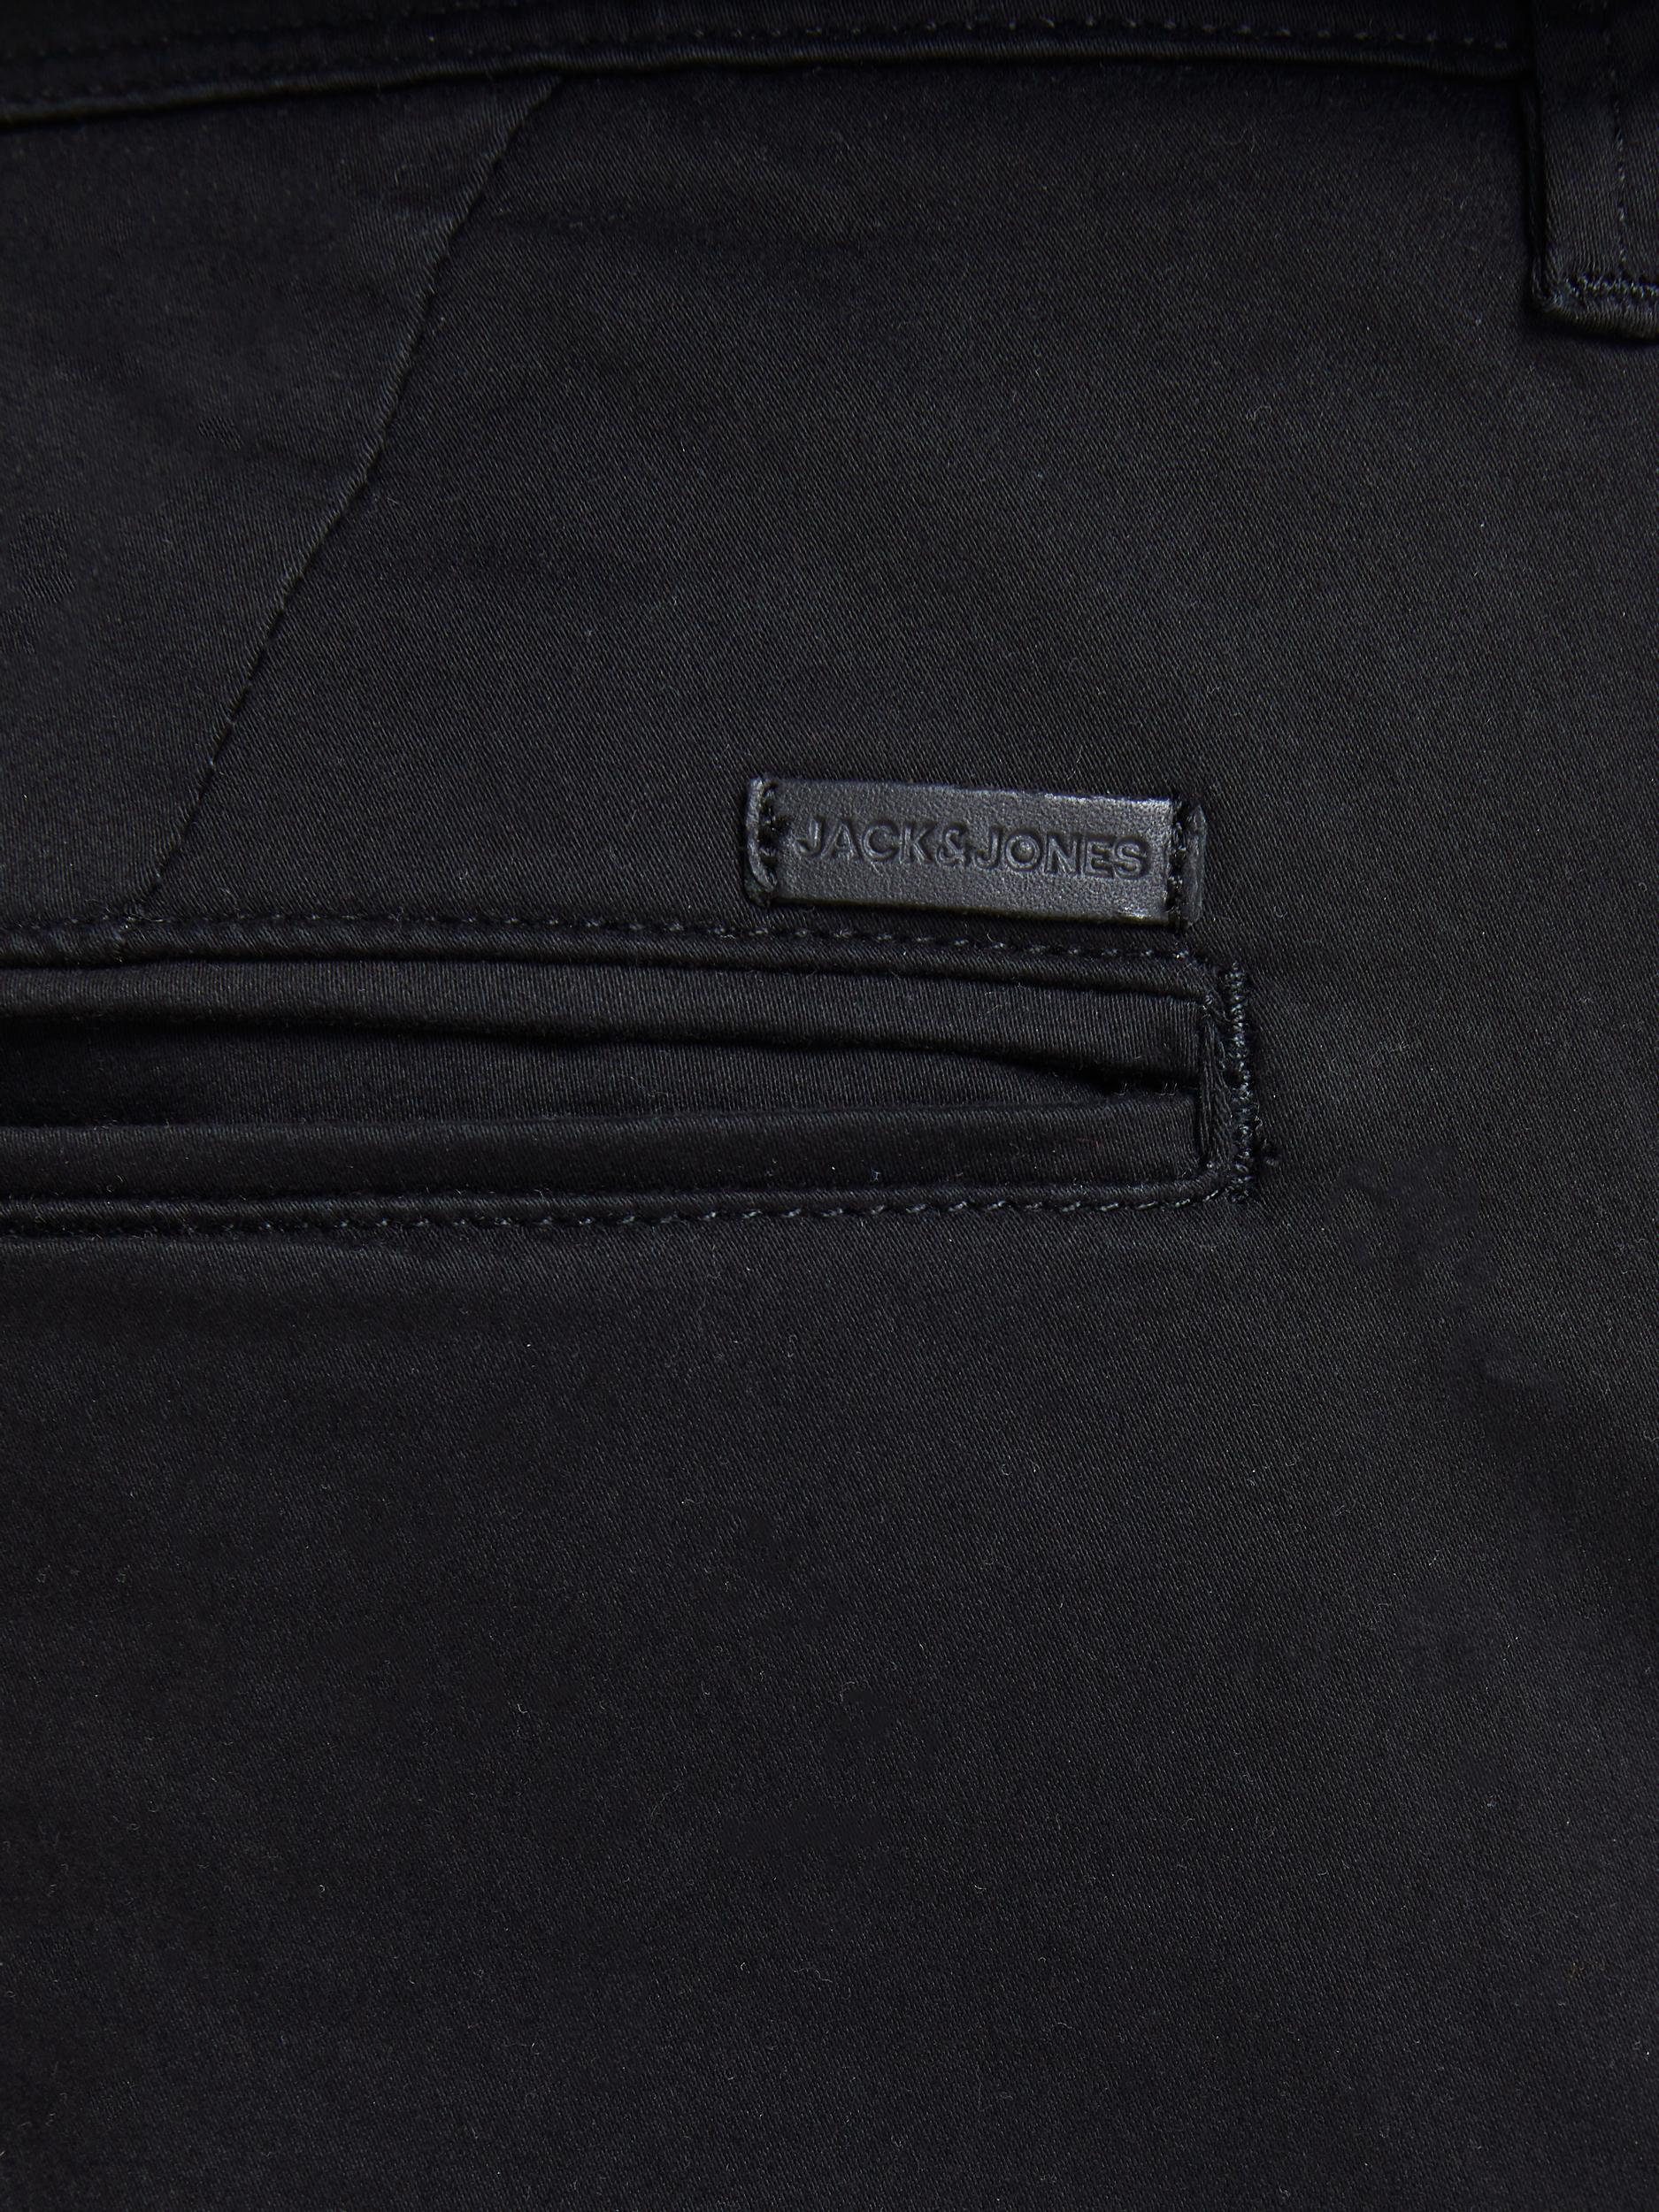 Jack & Jones Bowie shorts, black, medium